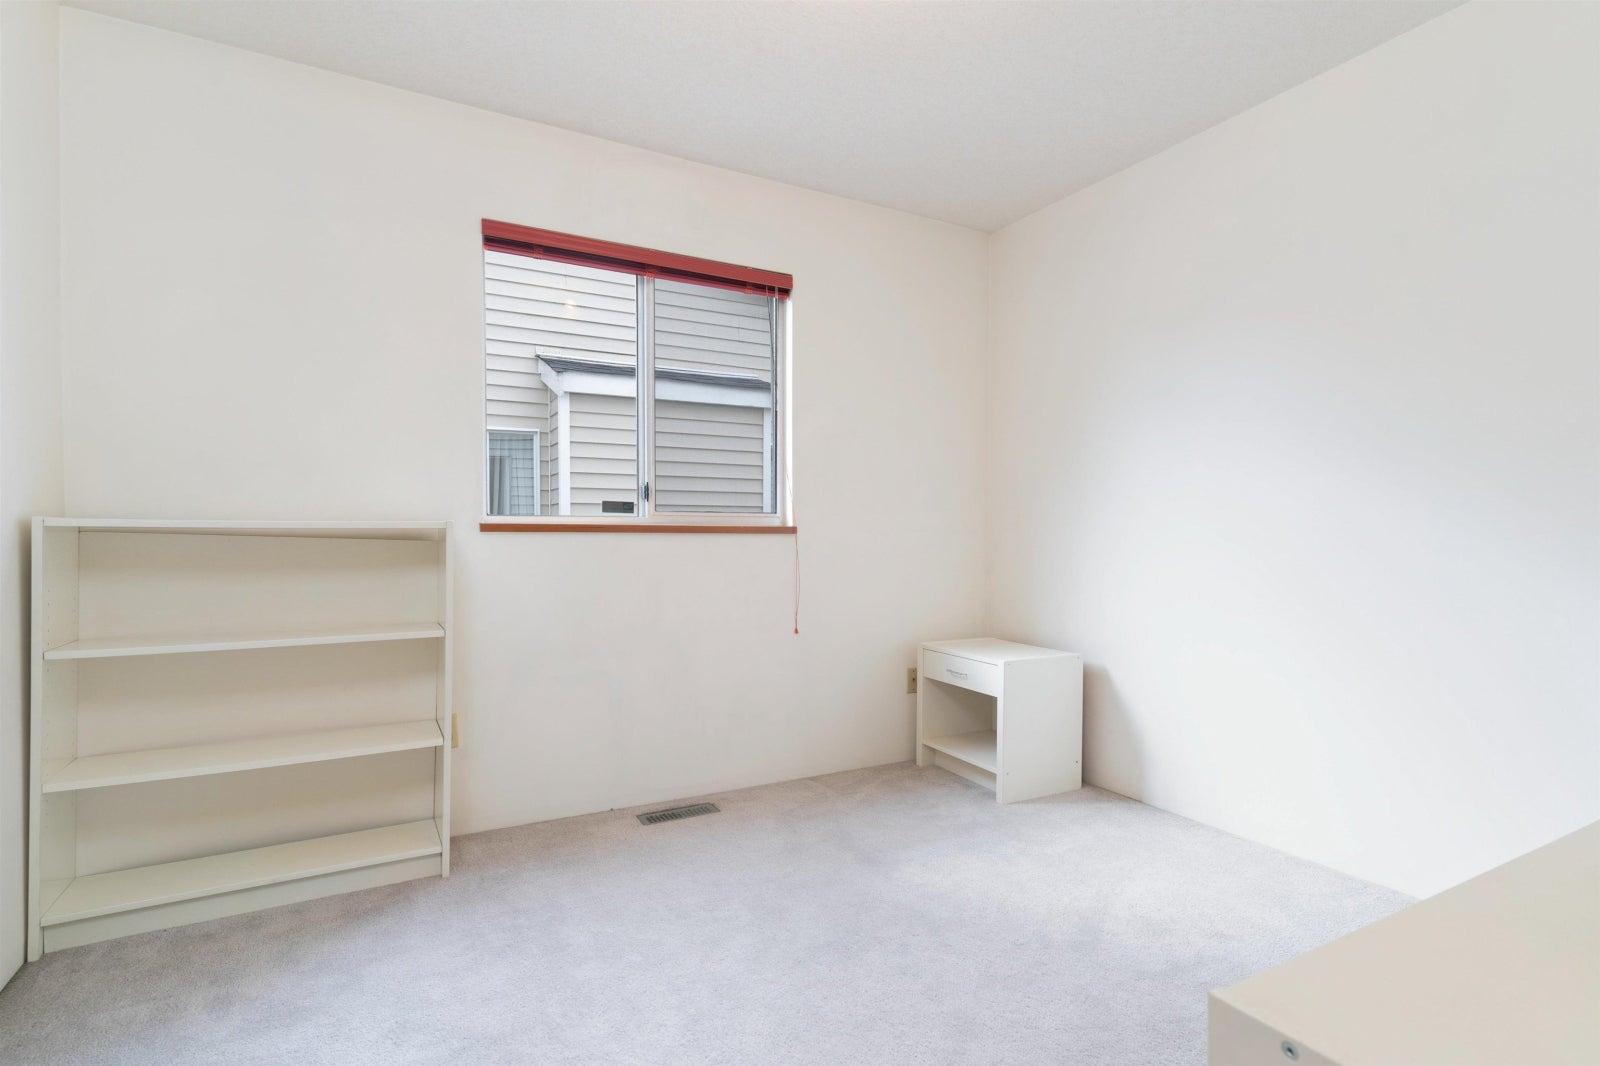 2556 RAVEN COURT - Eagle Ridge CQ House/Single Family for sale, 4 Bedrooms (R2611826) #21